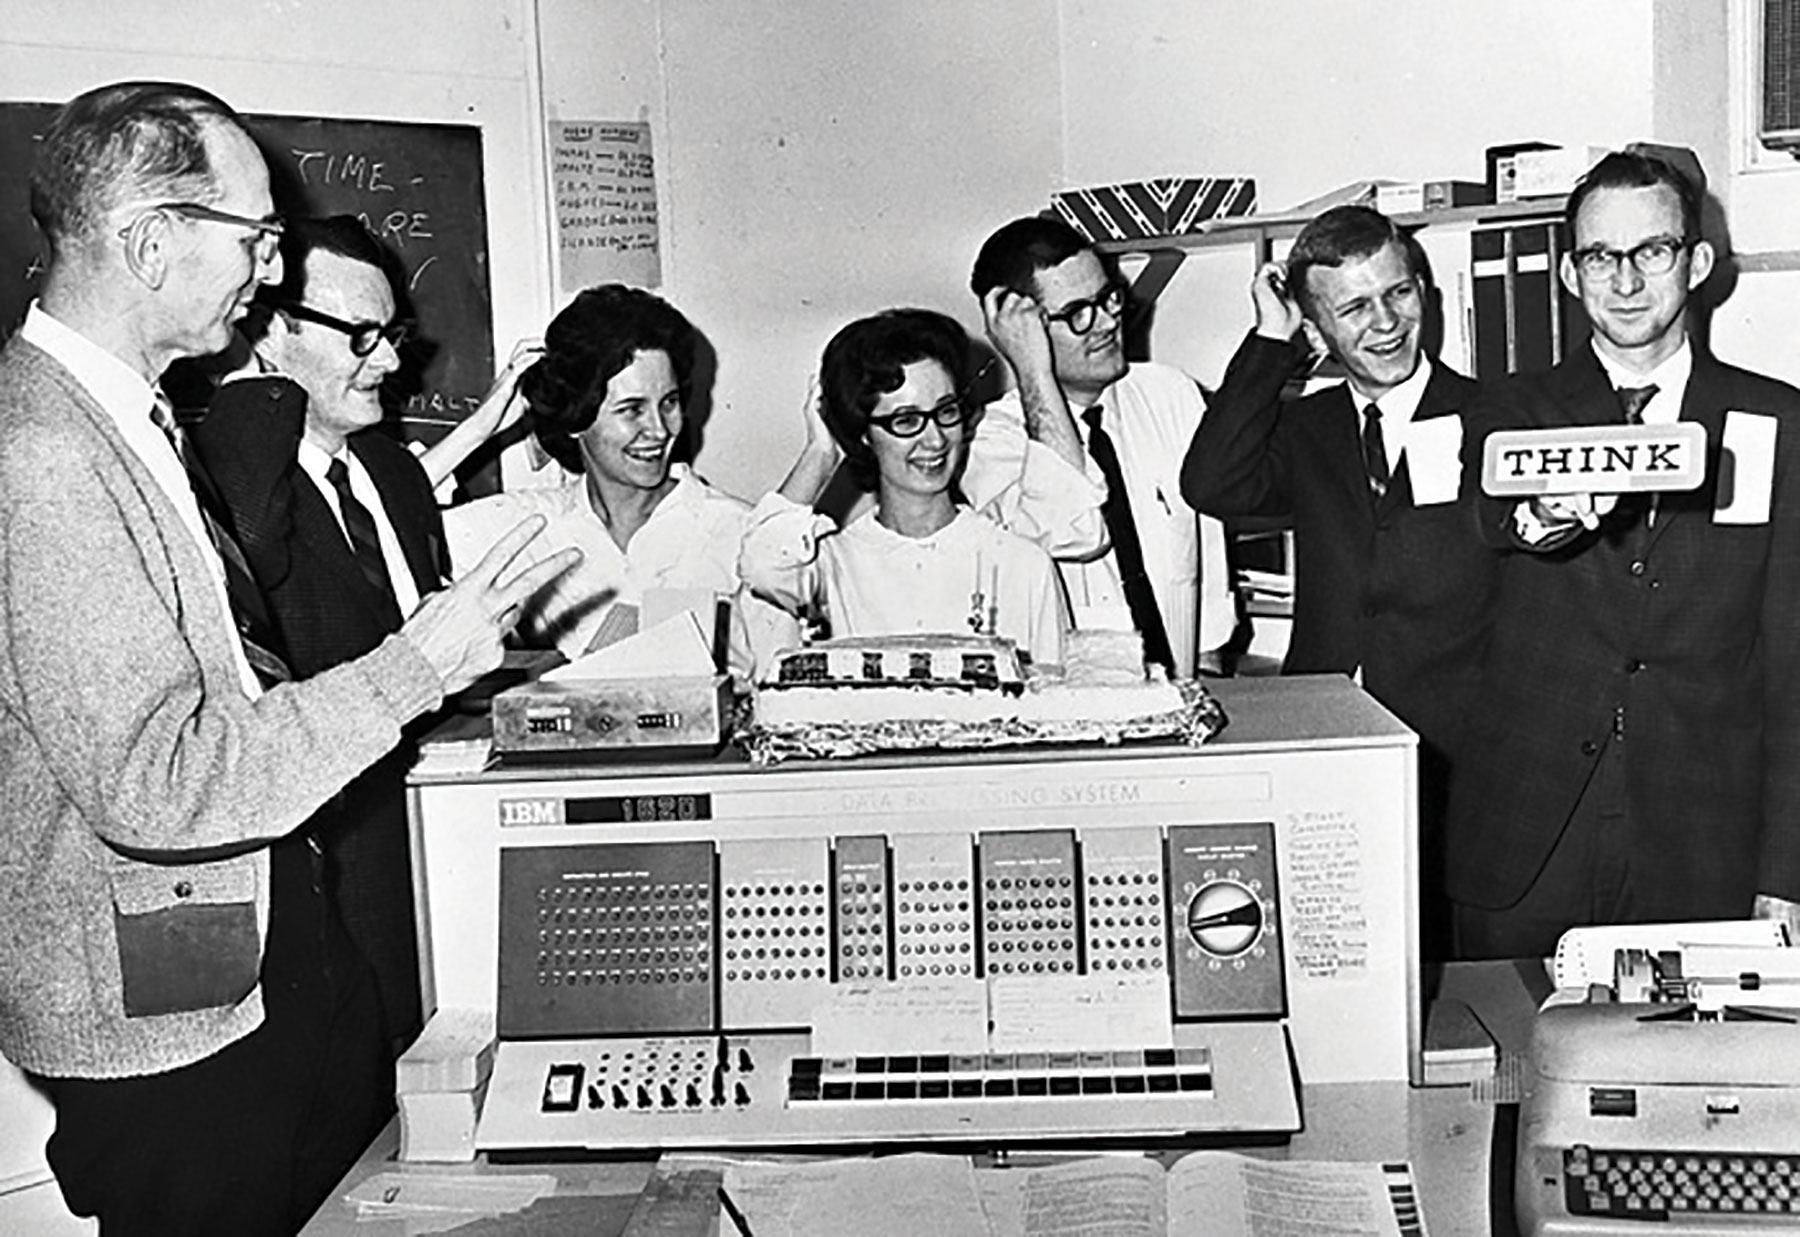 IBM 1620 at DePauw University. Photo courtesy of Richard Burkett.